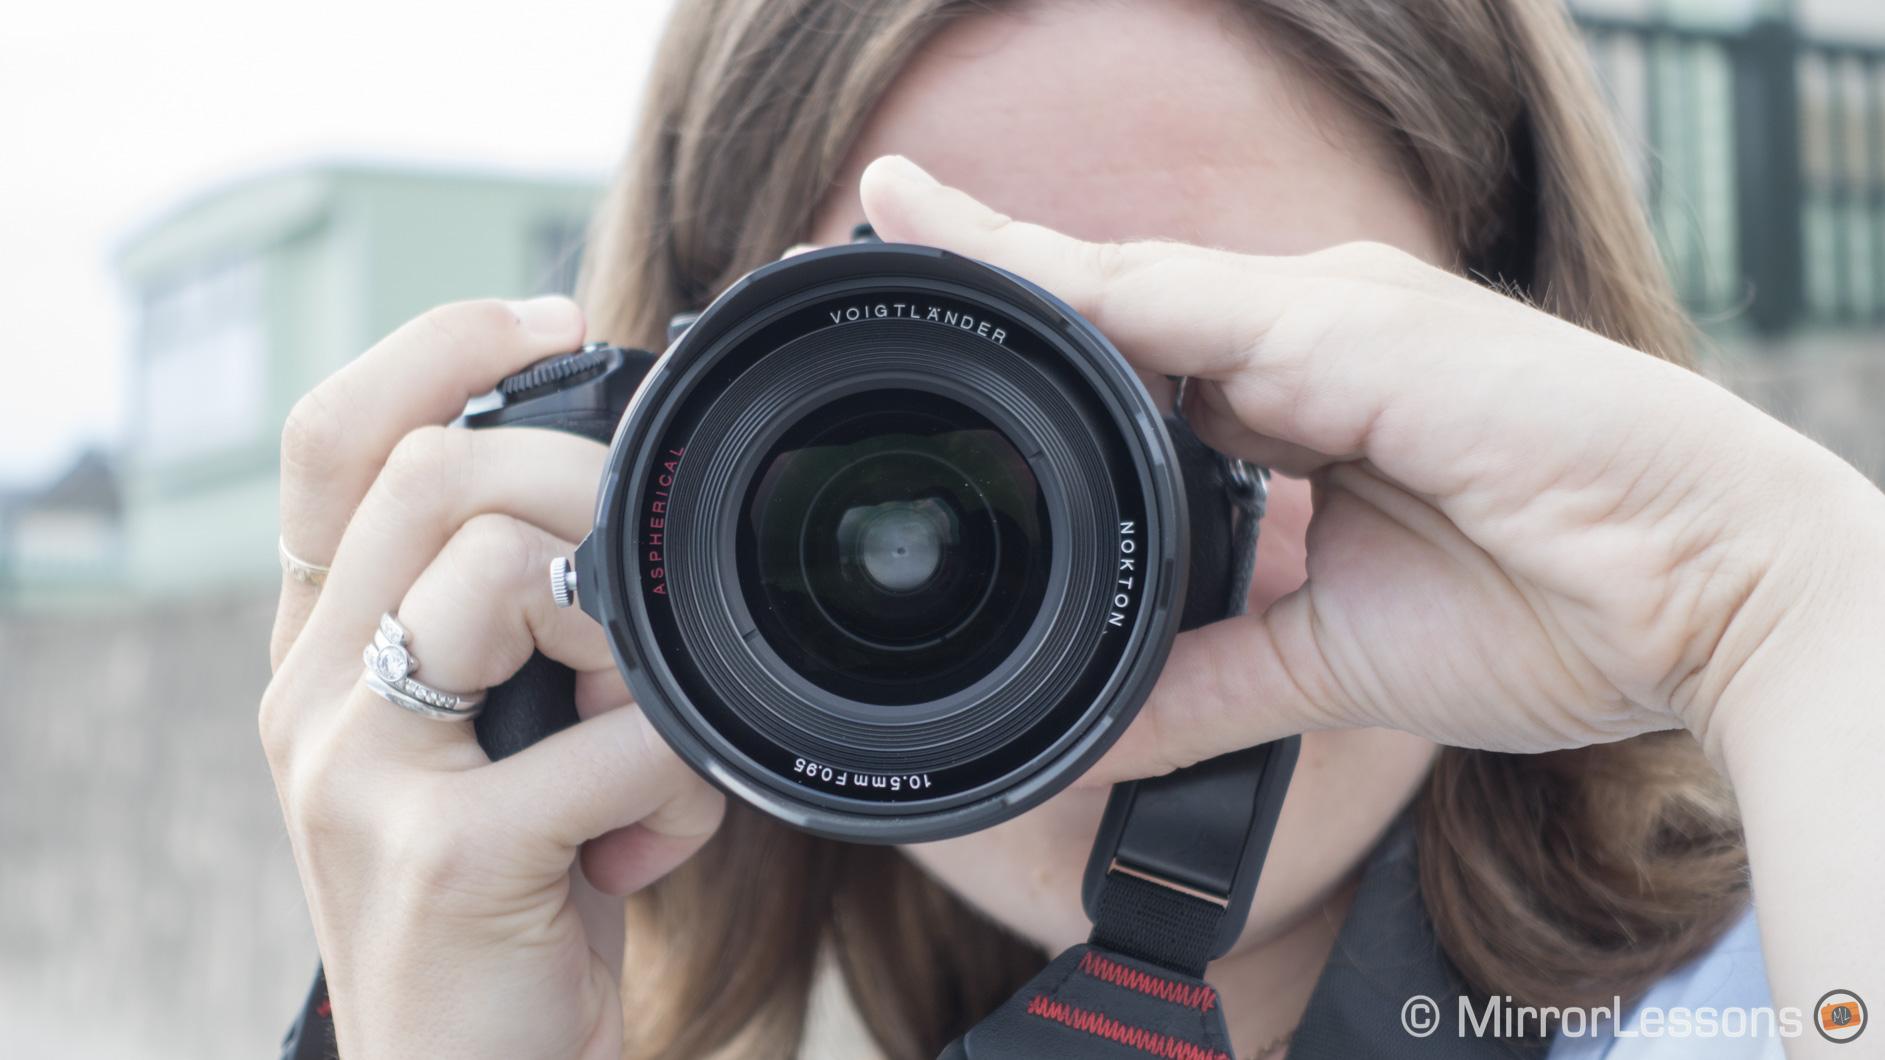 voigtlander 10.5mm f/0.95 review